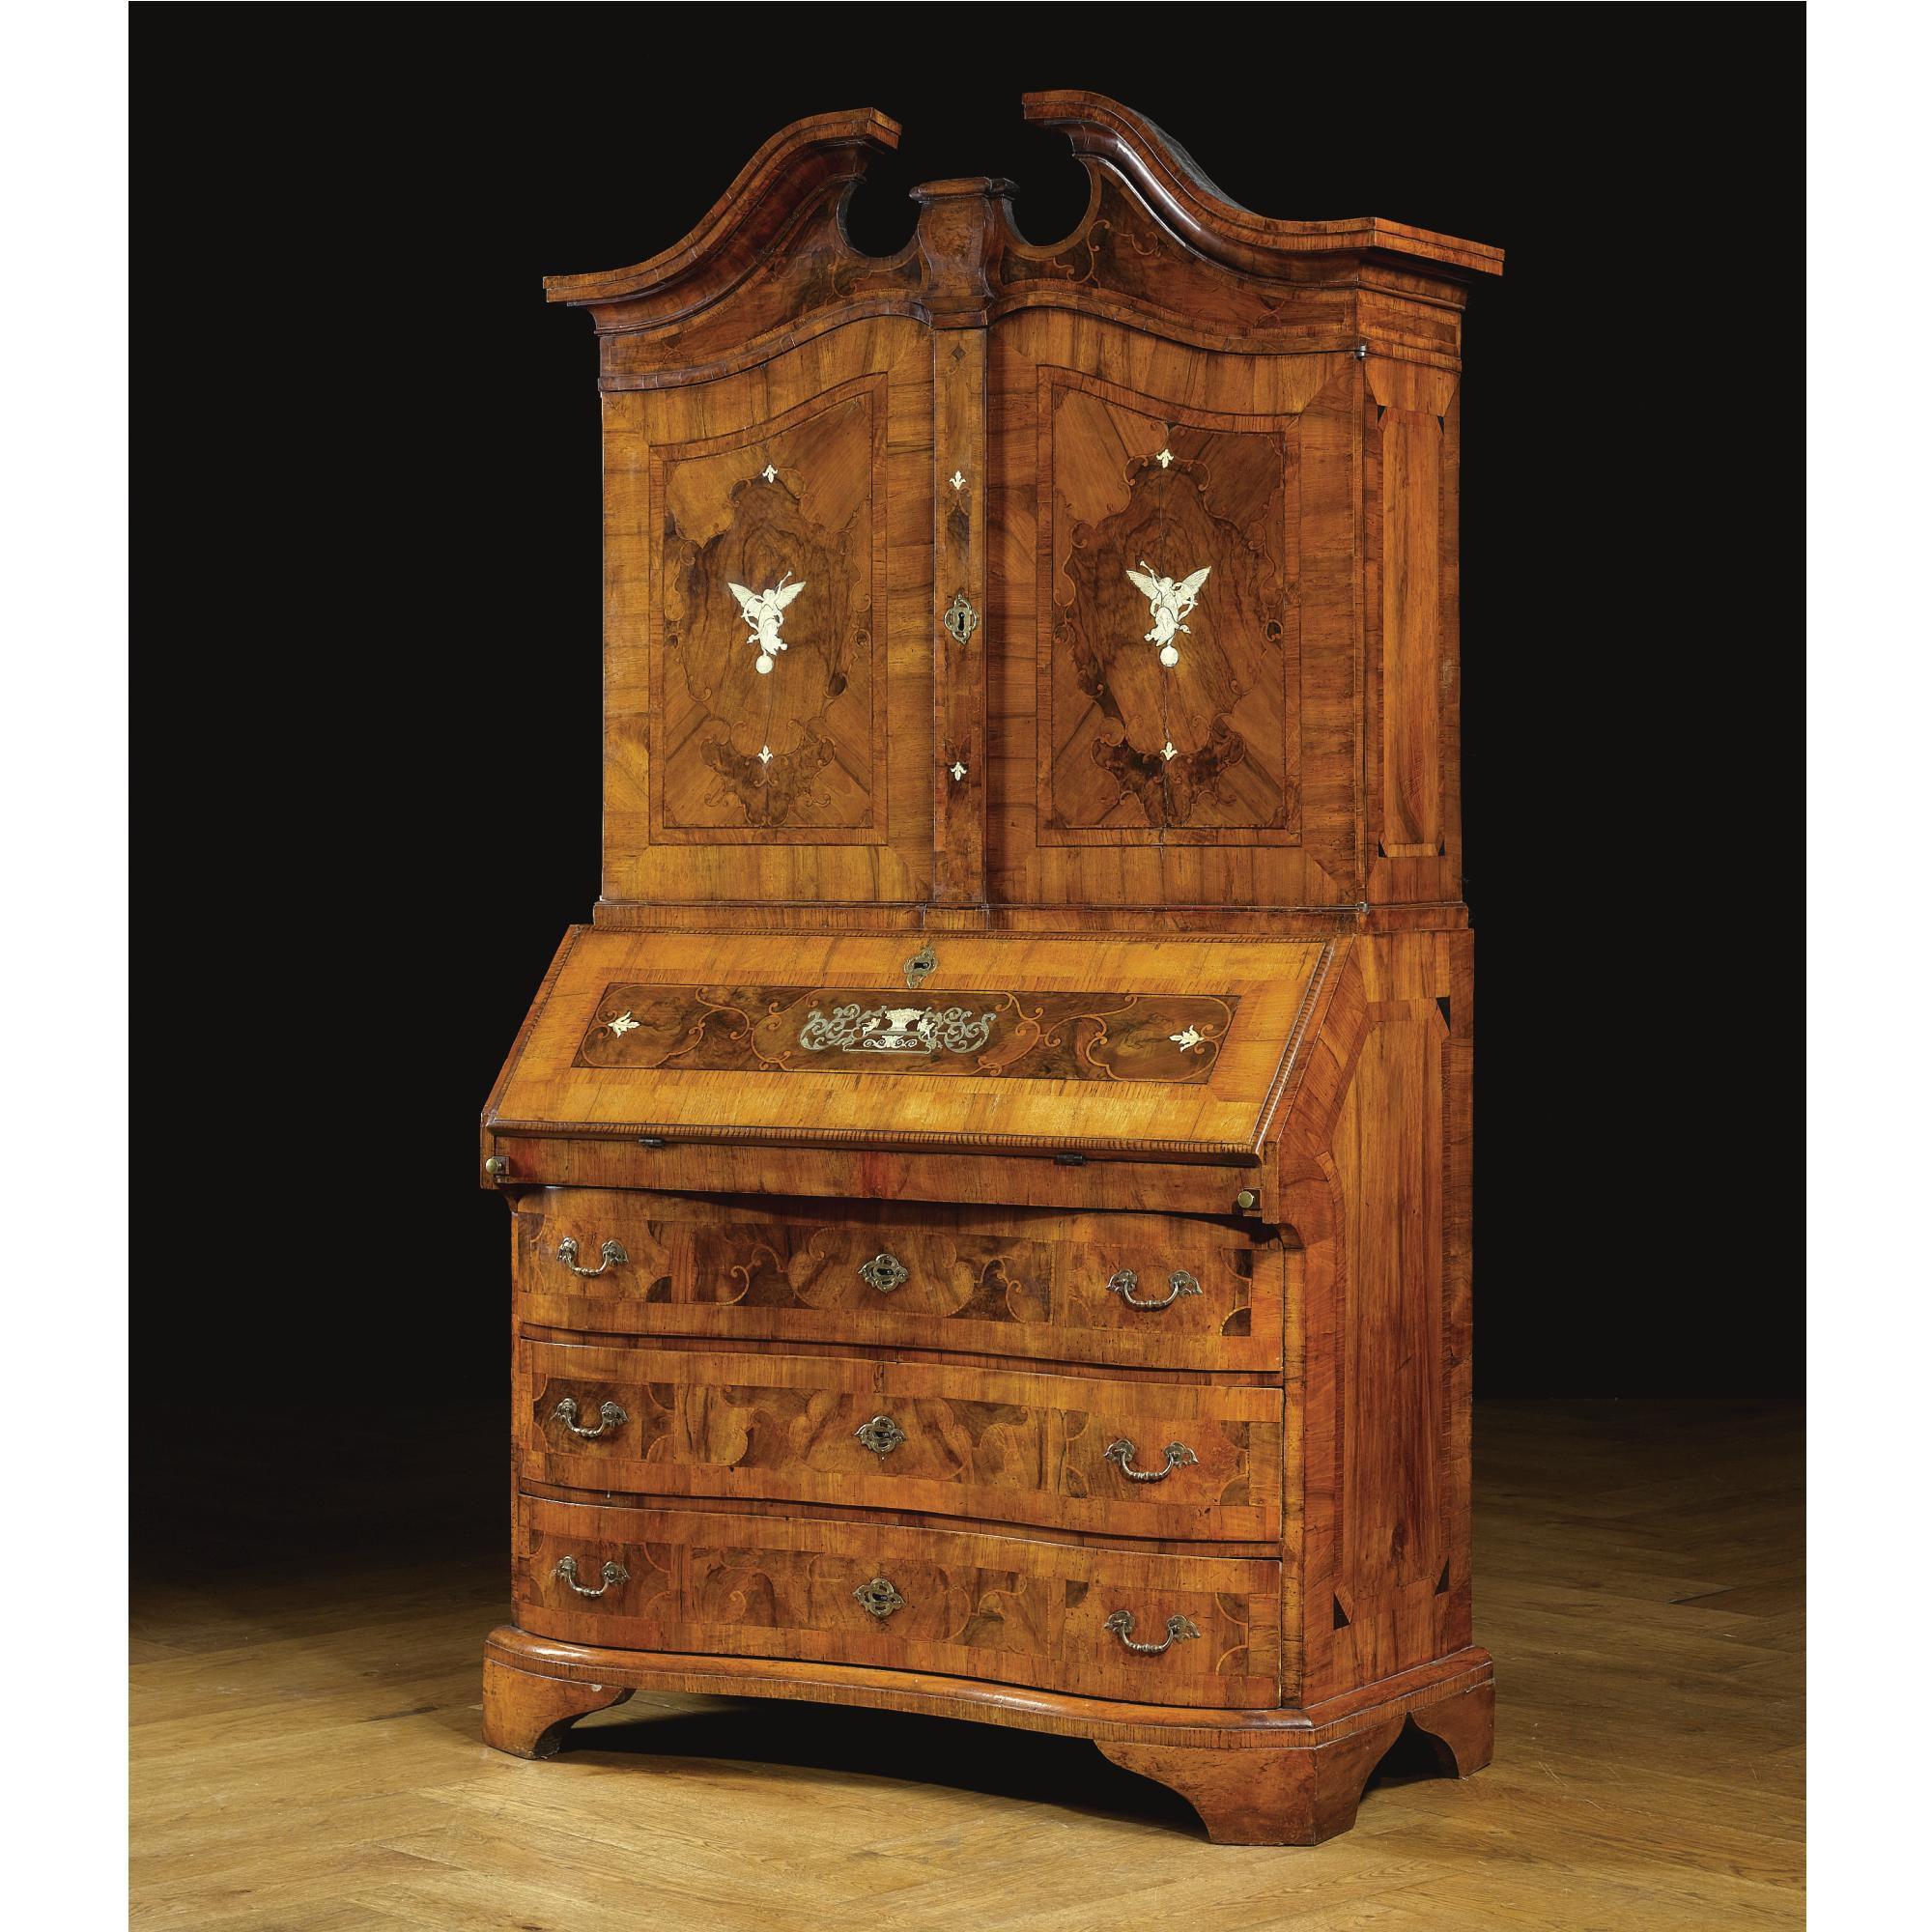 A North German Walnut Burr Walnut Pewter And Ivory Inlaid Bureau Cabinet Br Brunswick Baroque Mid 18th Century Lot Barock Mobel Barock Biedermeier